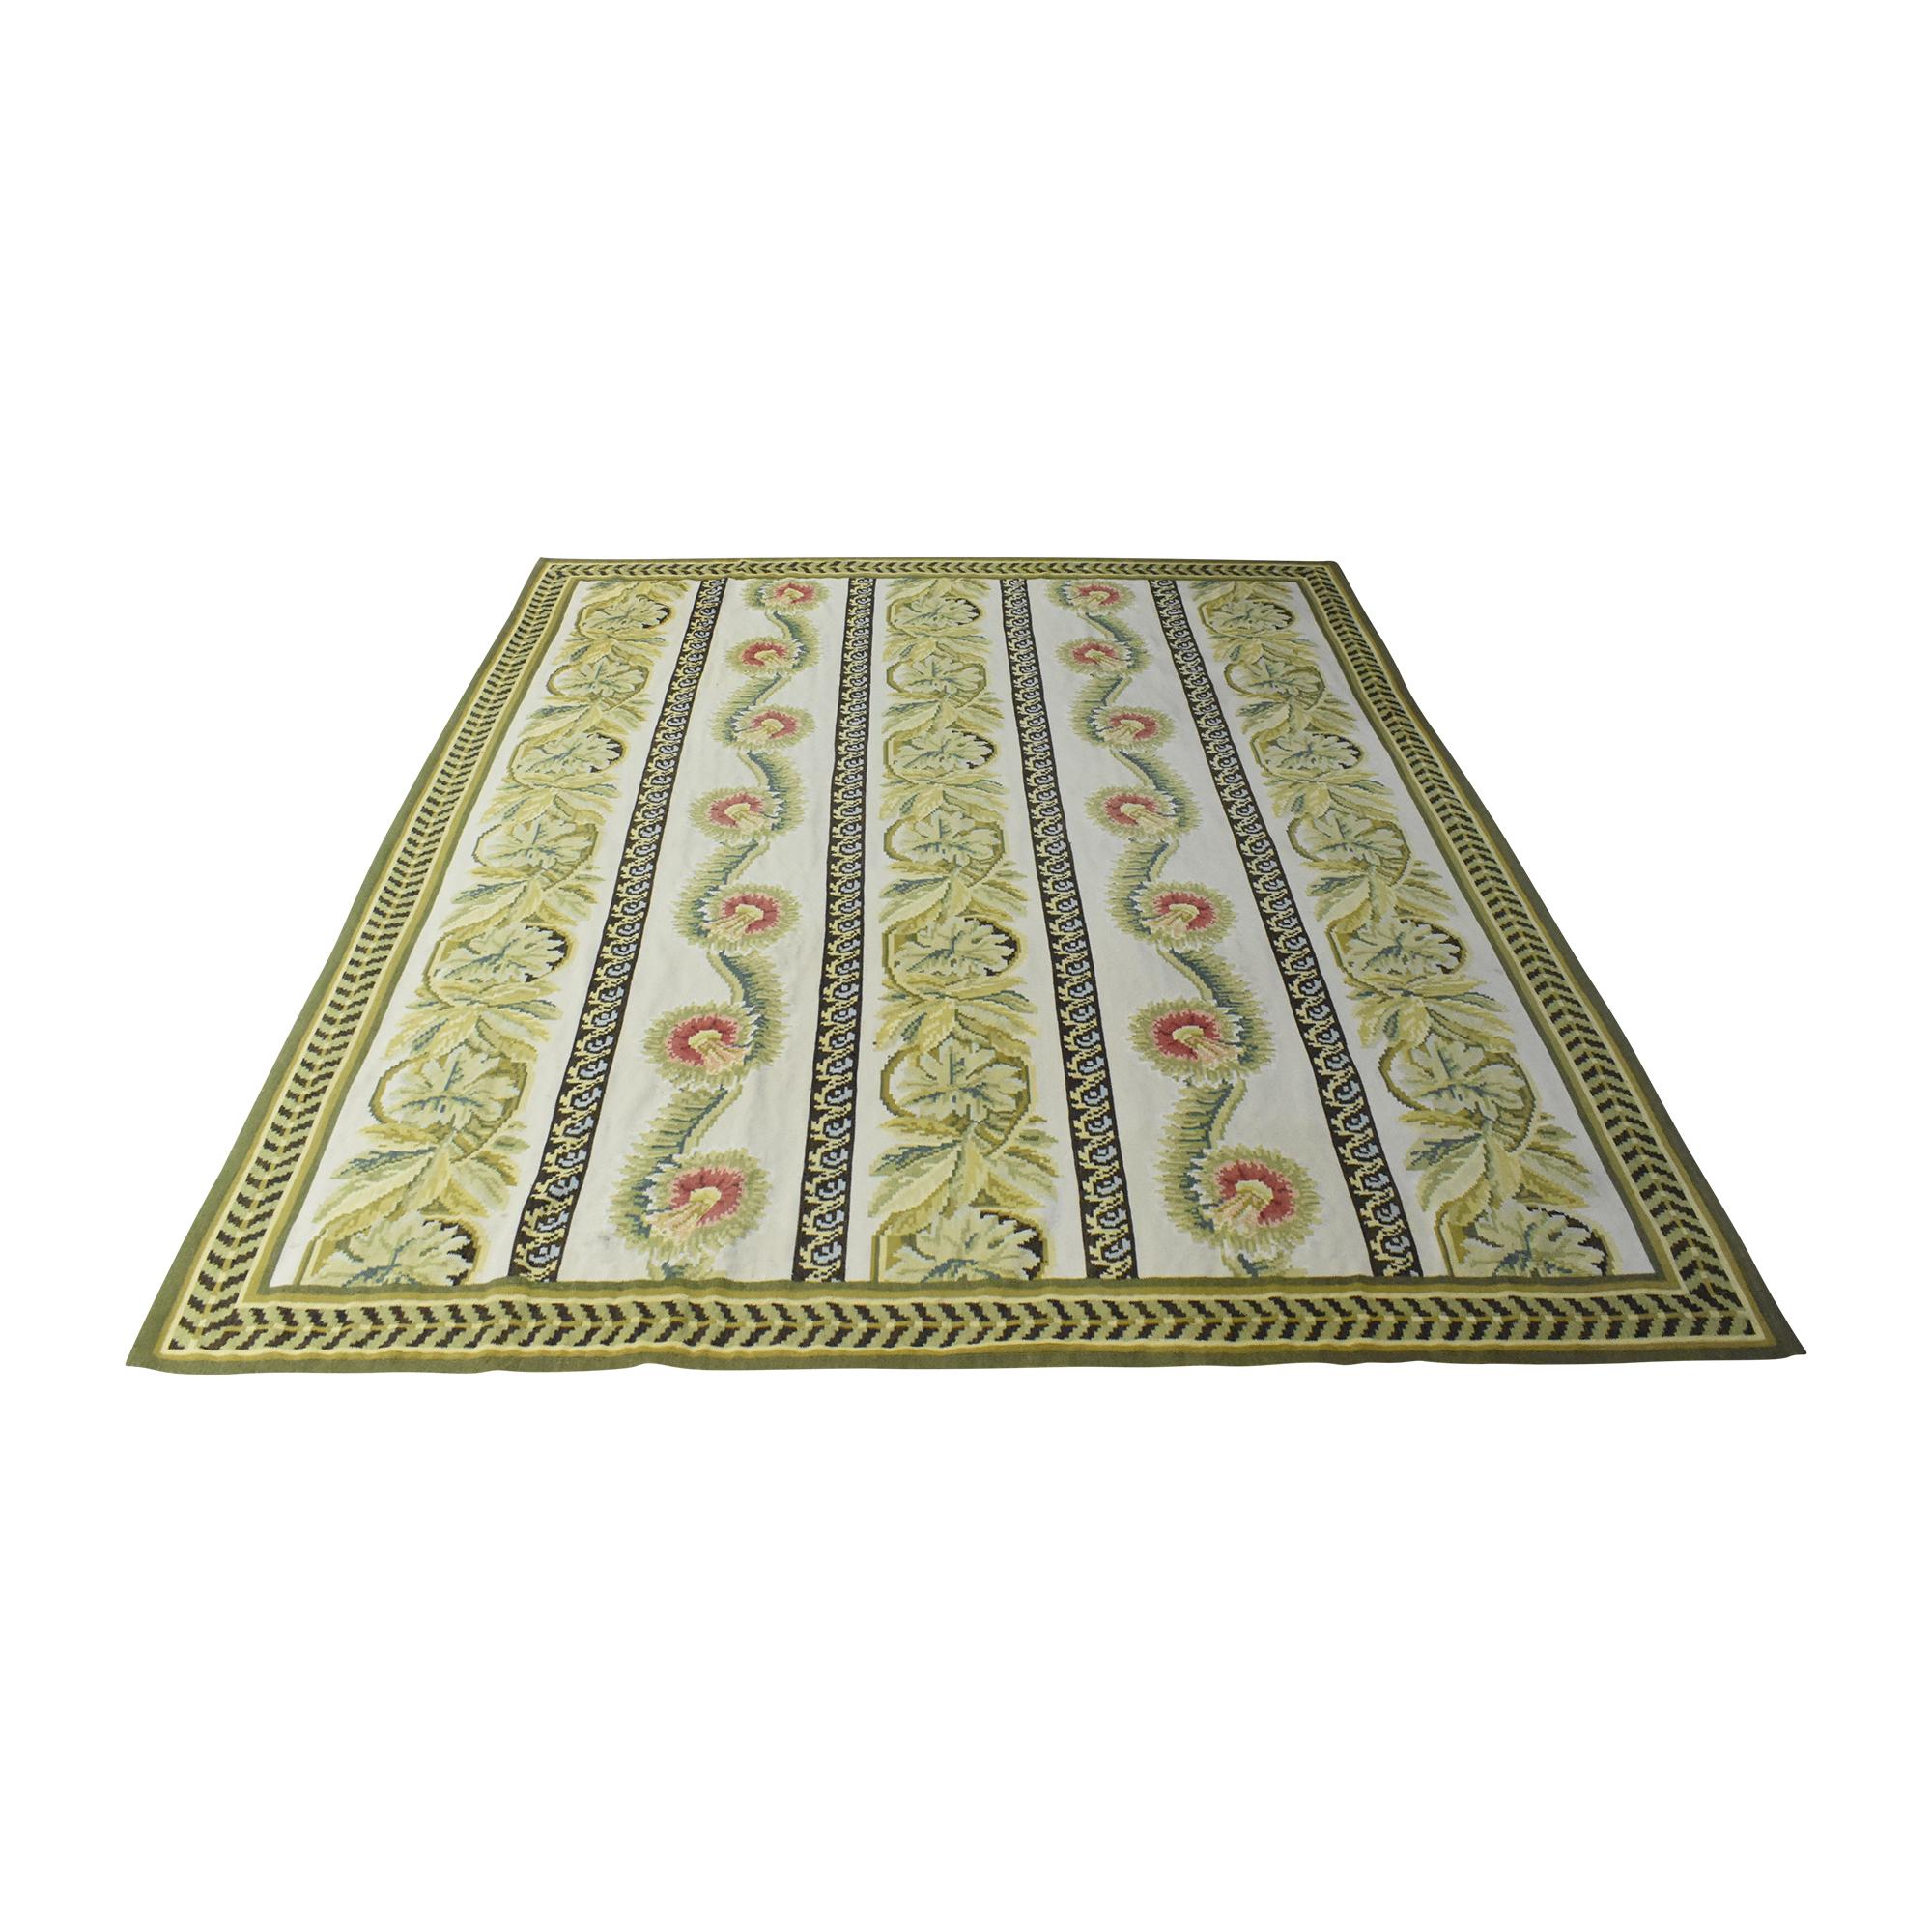 Stark Carpet Patterned Area Rug / Rugs